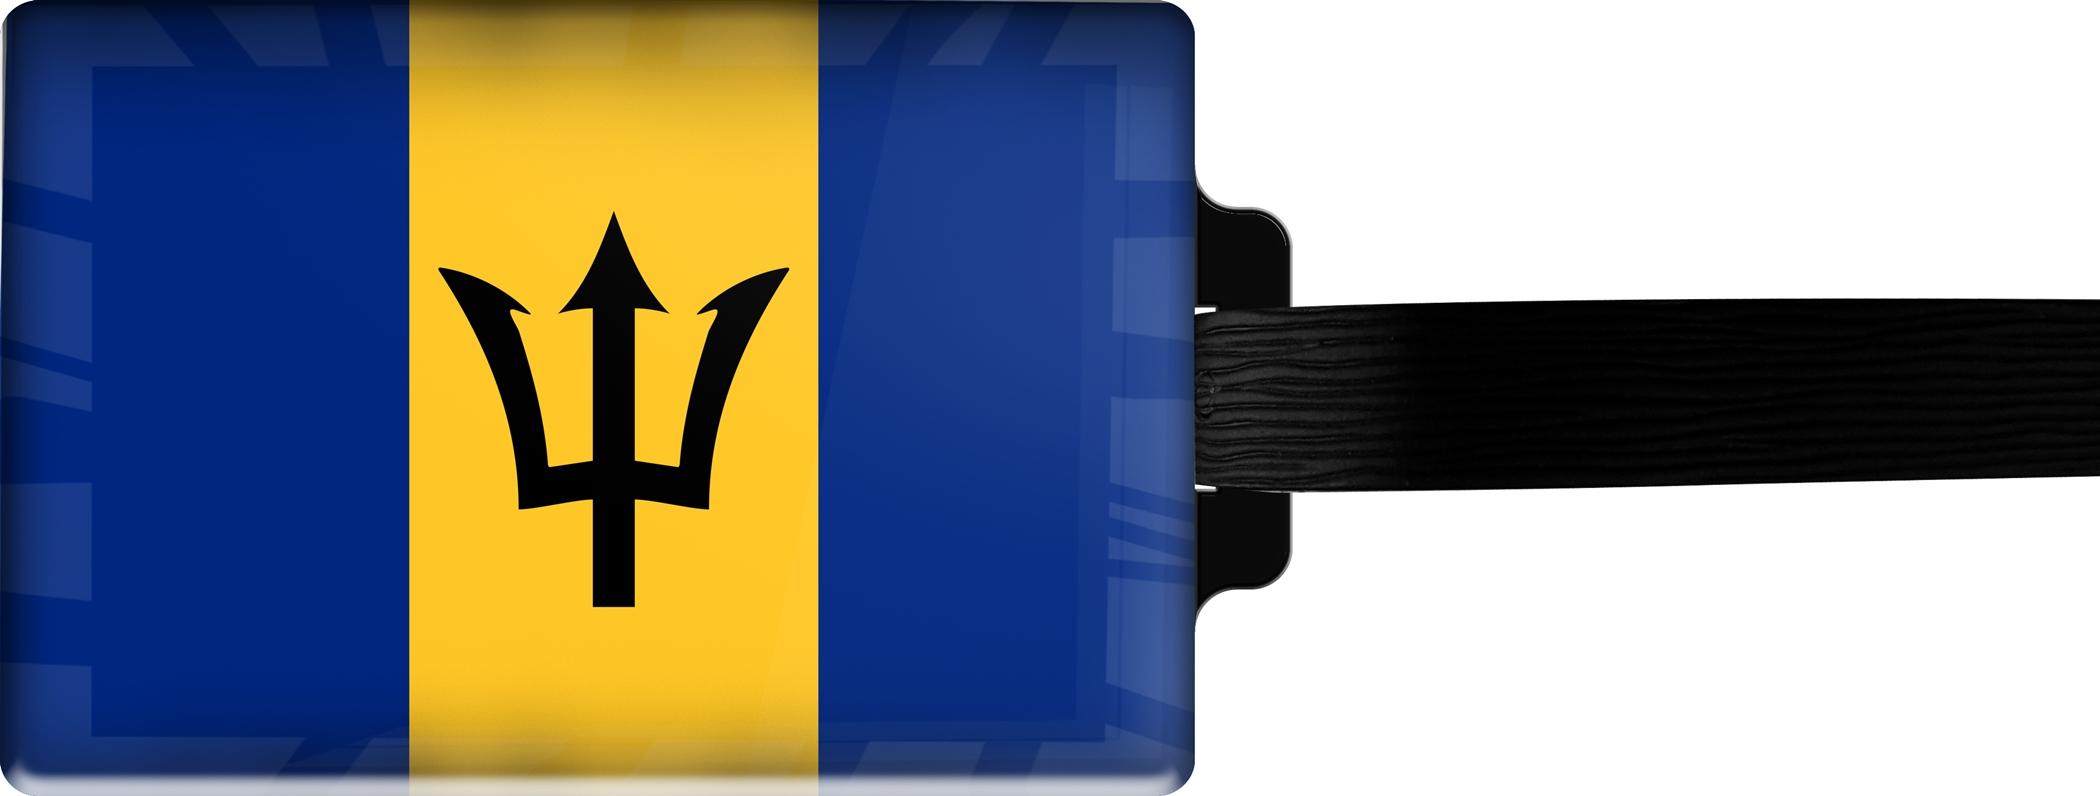 Hochwertiger Gepäckanhänger aus Acrylglas | FLAGGE BARBADOS | metALUm #00081